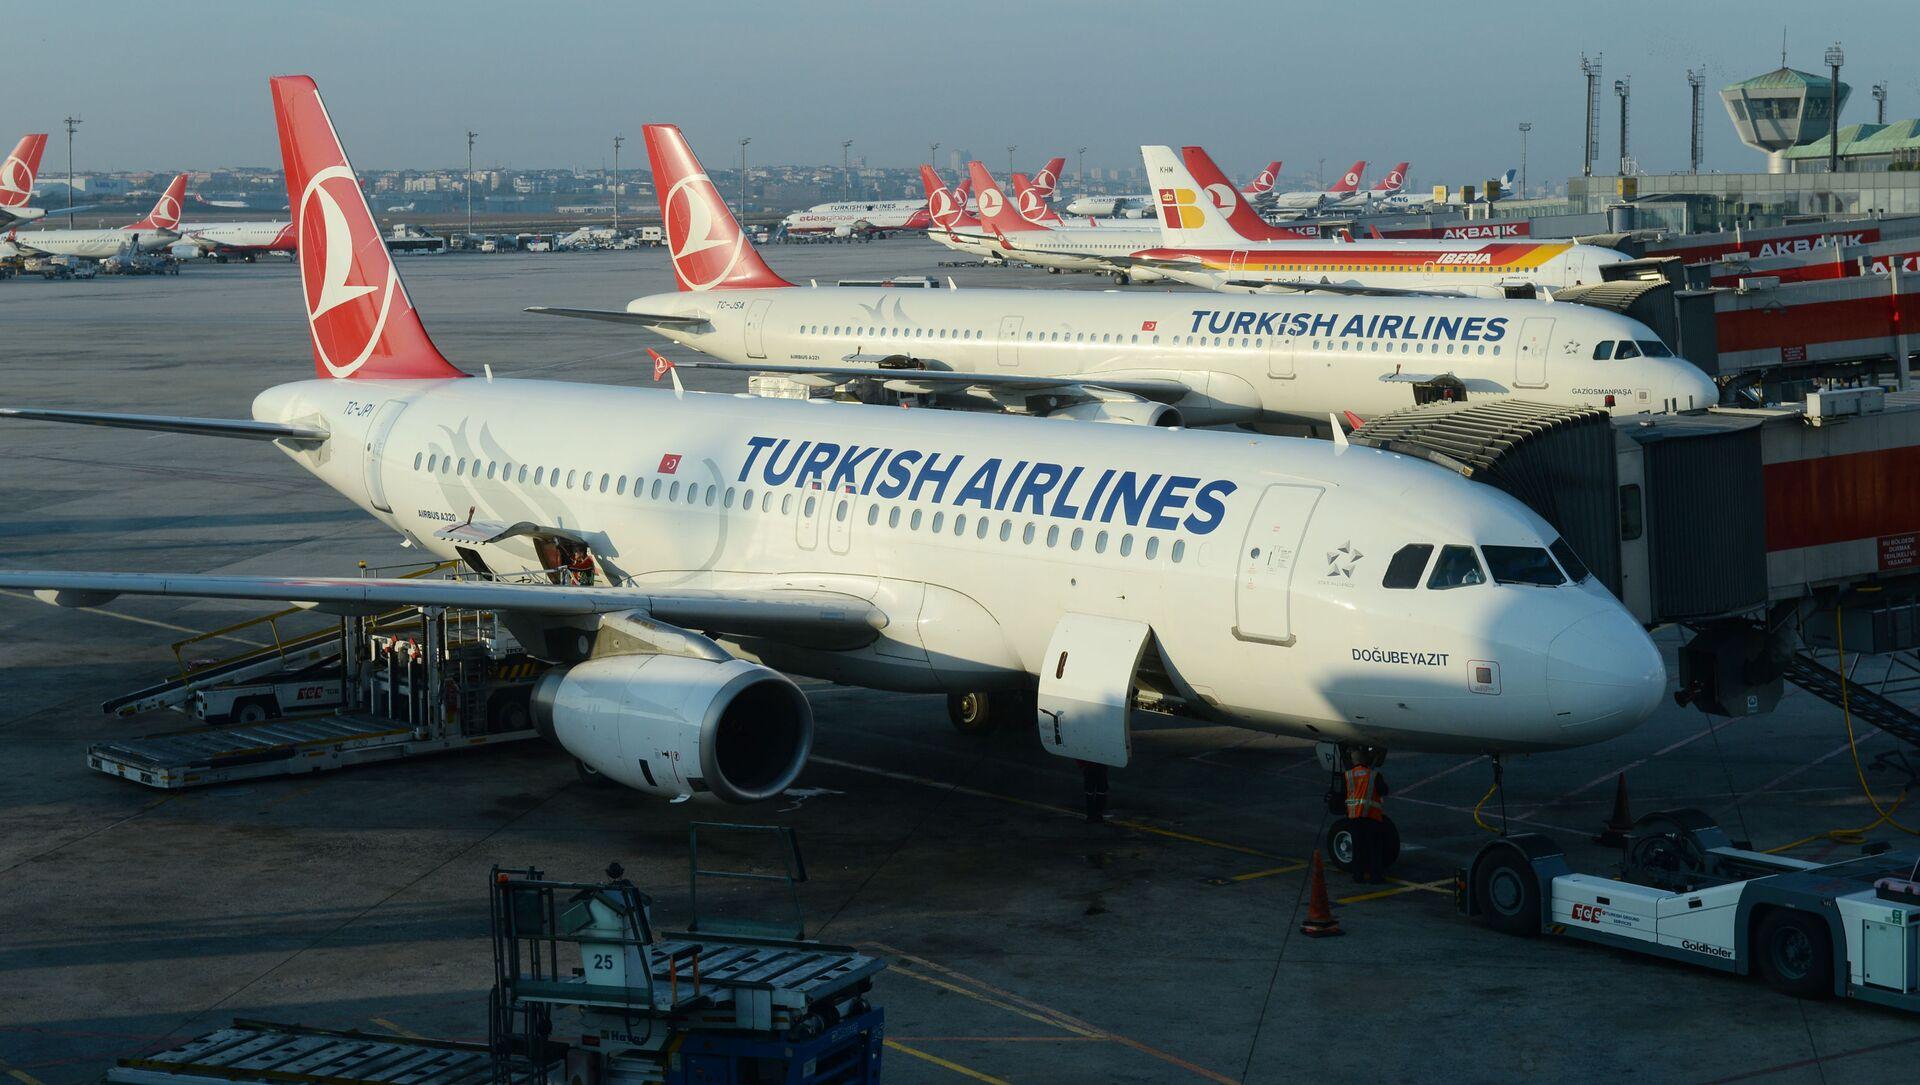 Samoloty Airbus A320 i A321 linii lotniczych Turkish Airlines na lotnisku Stambuł-Atatürk - Sputnik Polska, 1920, 04.04.2021